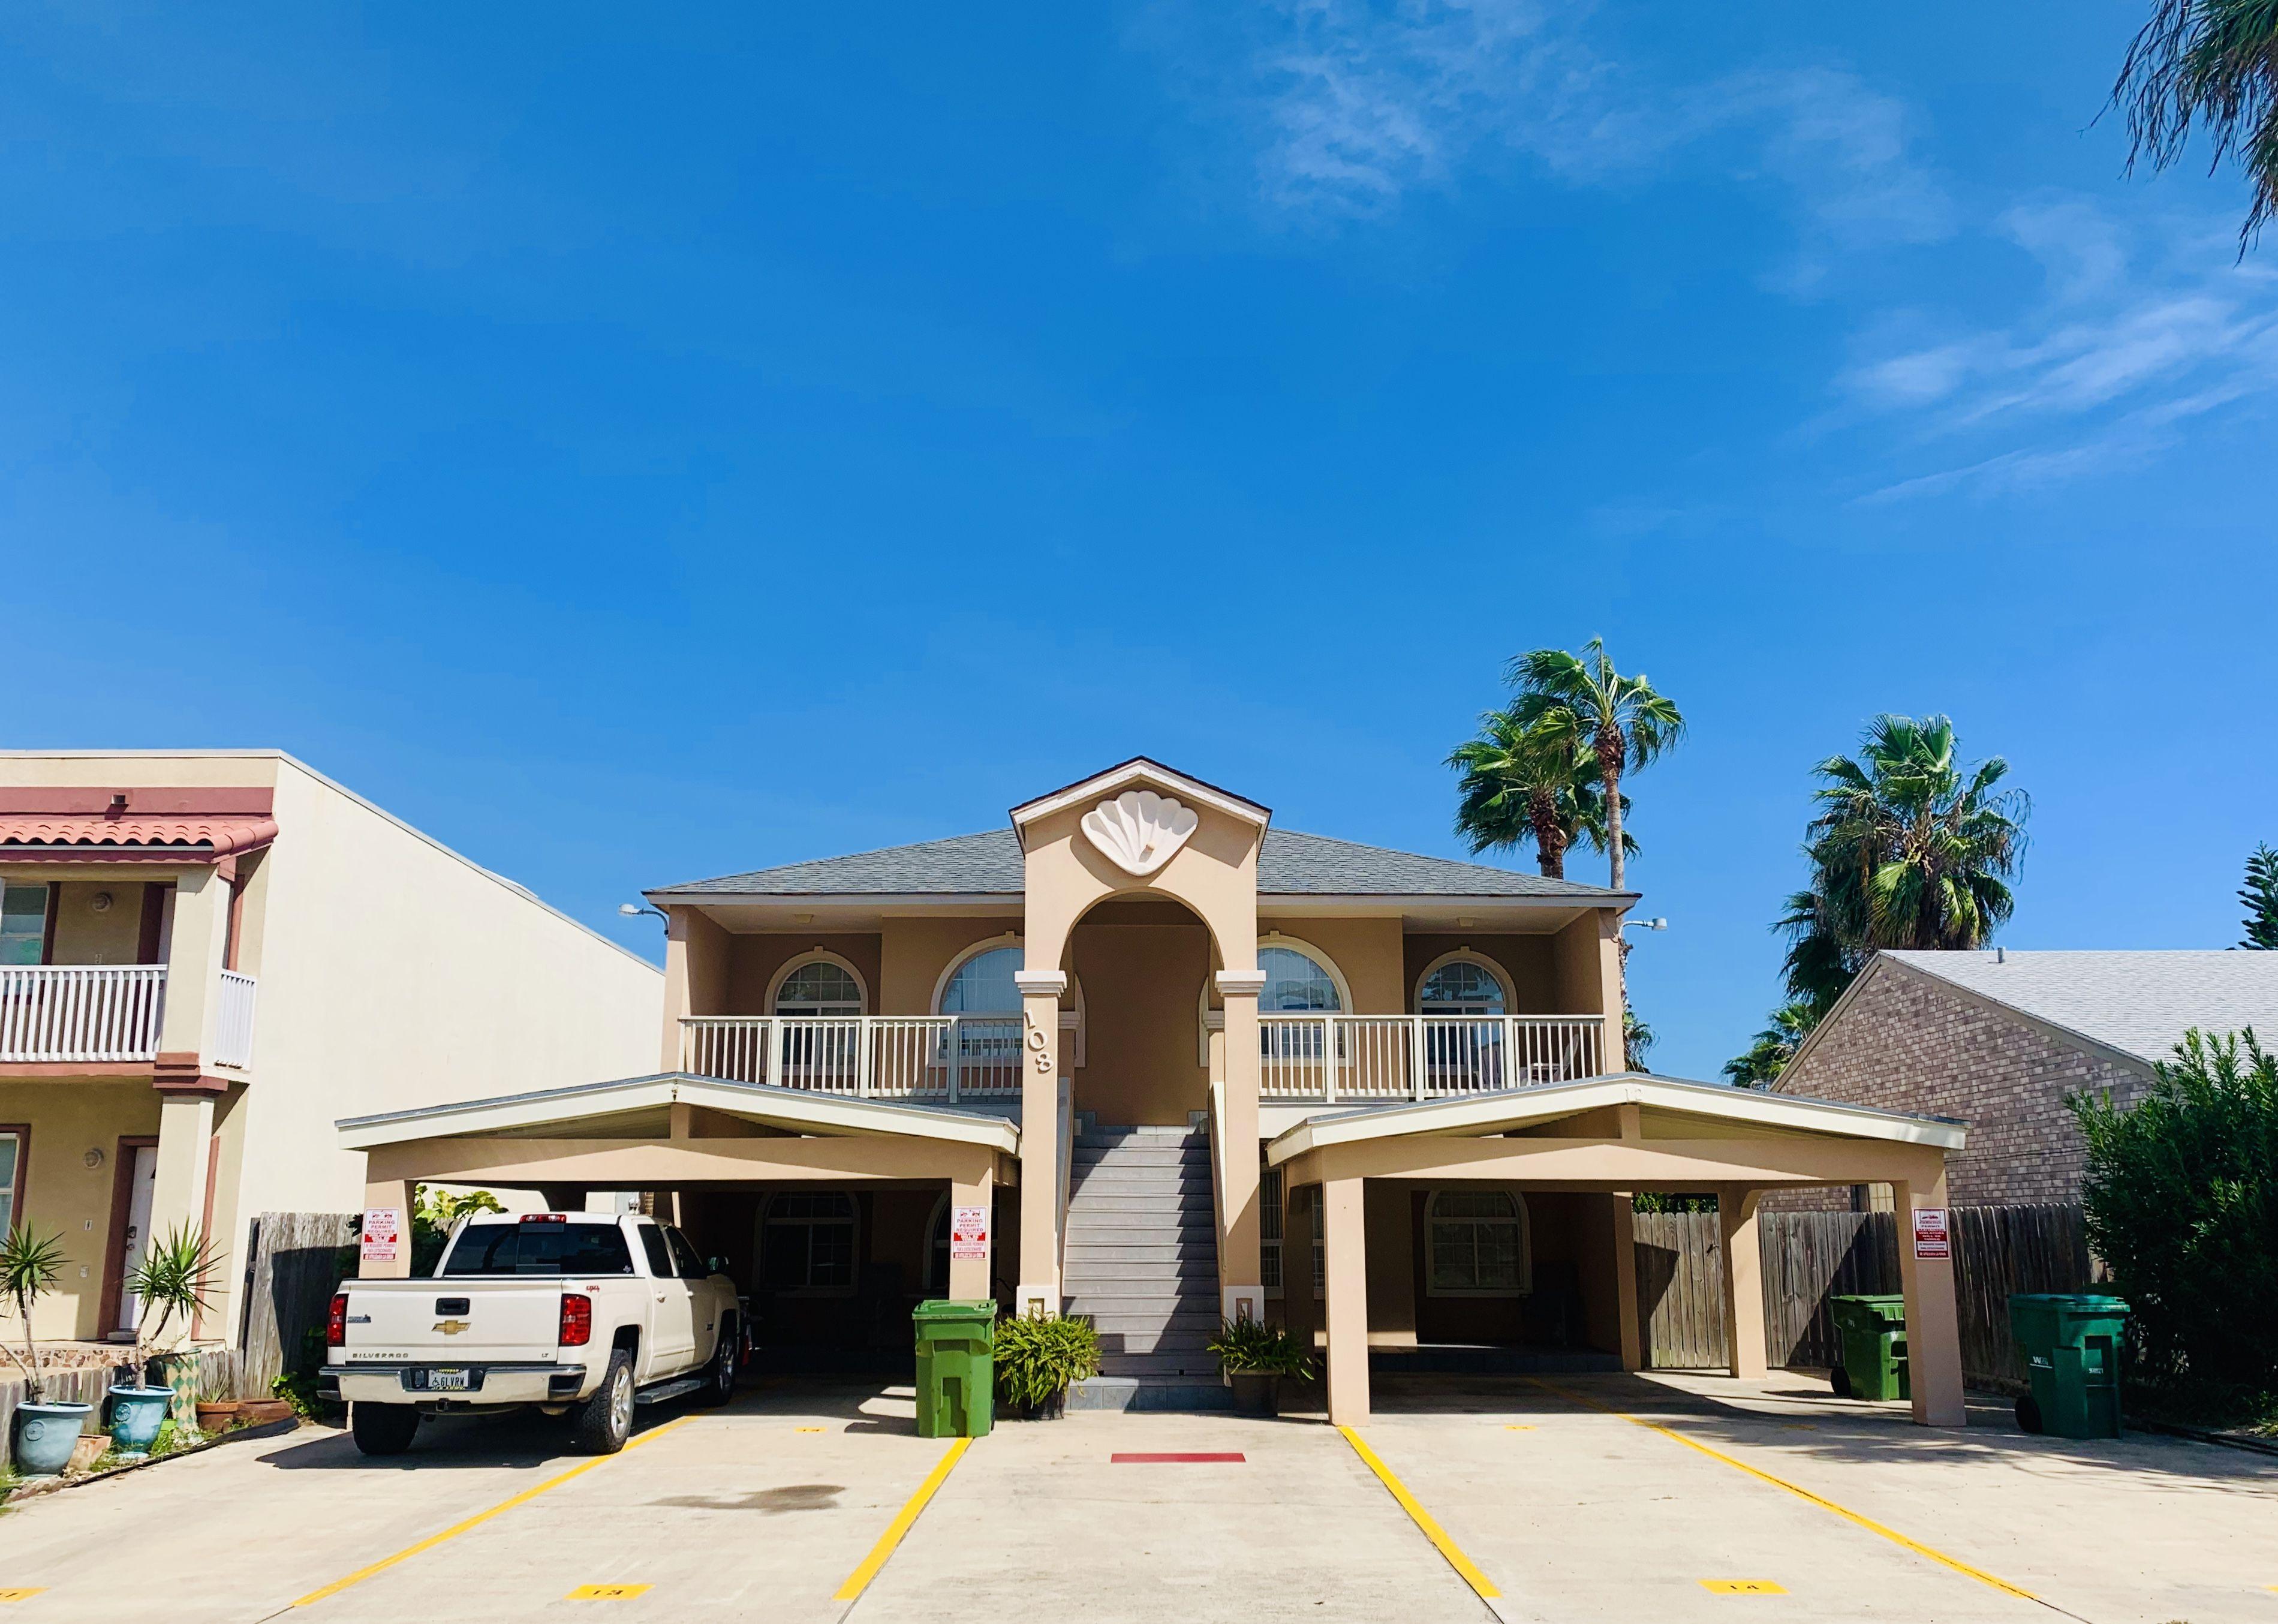 Gulf interior 22 fully furnished condo great rental